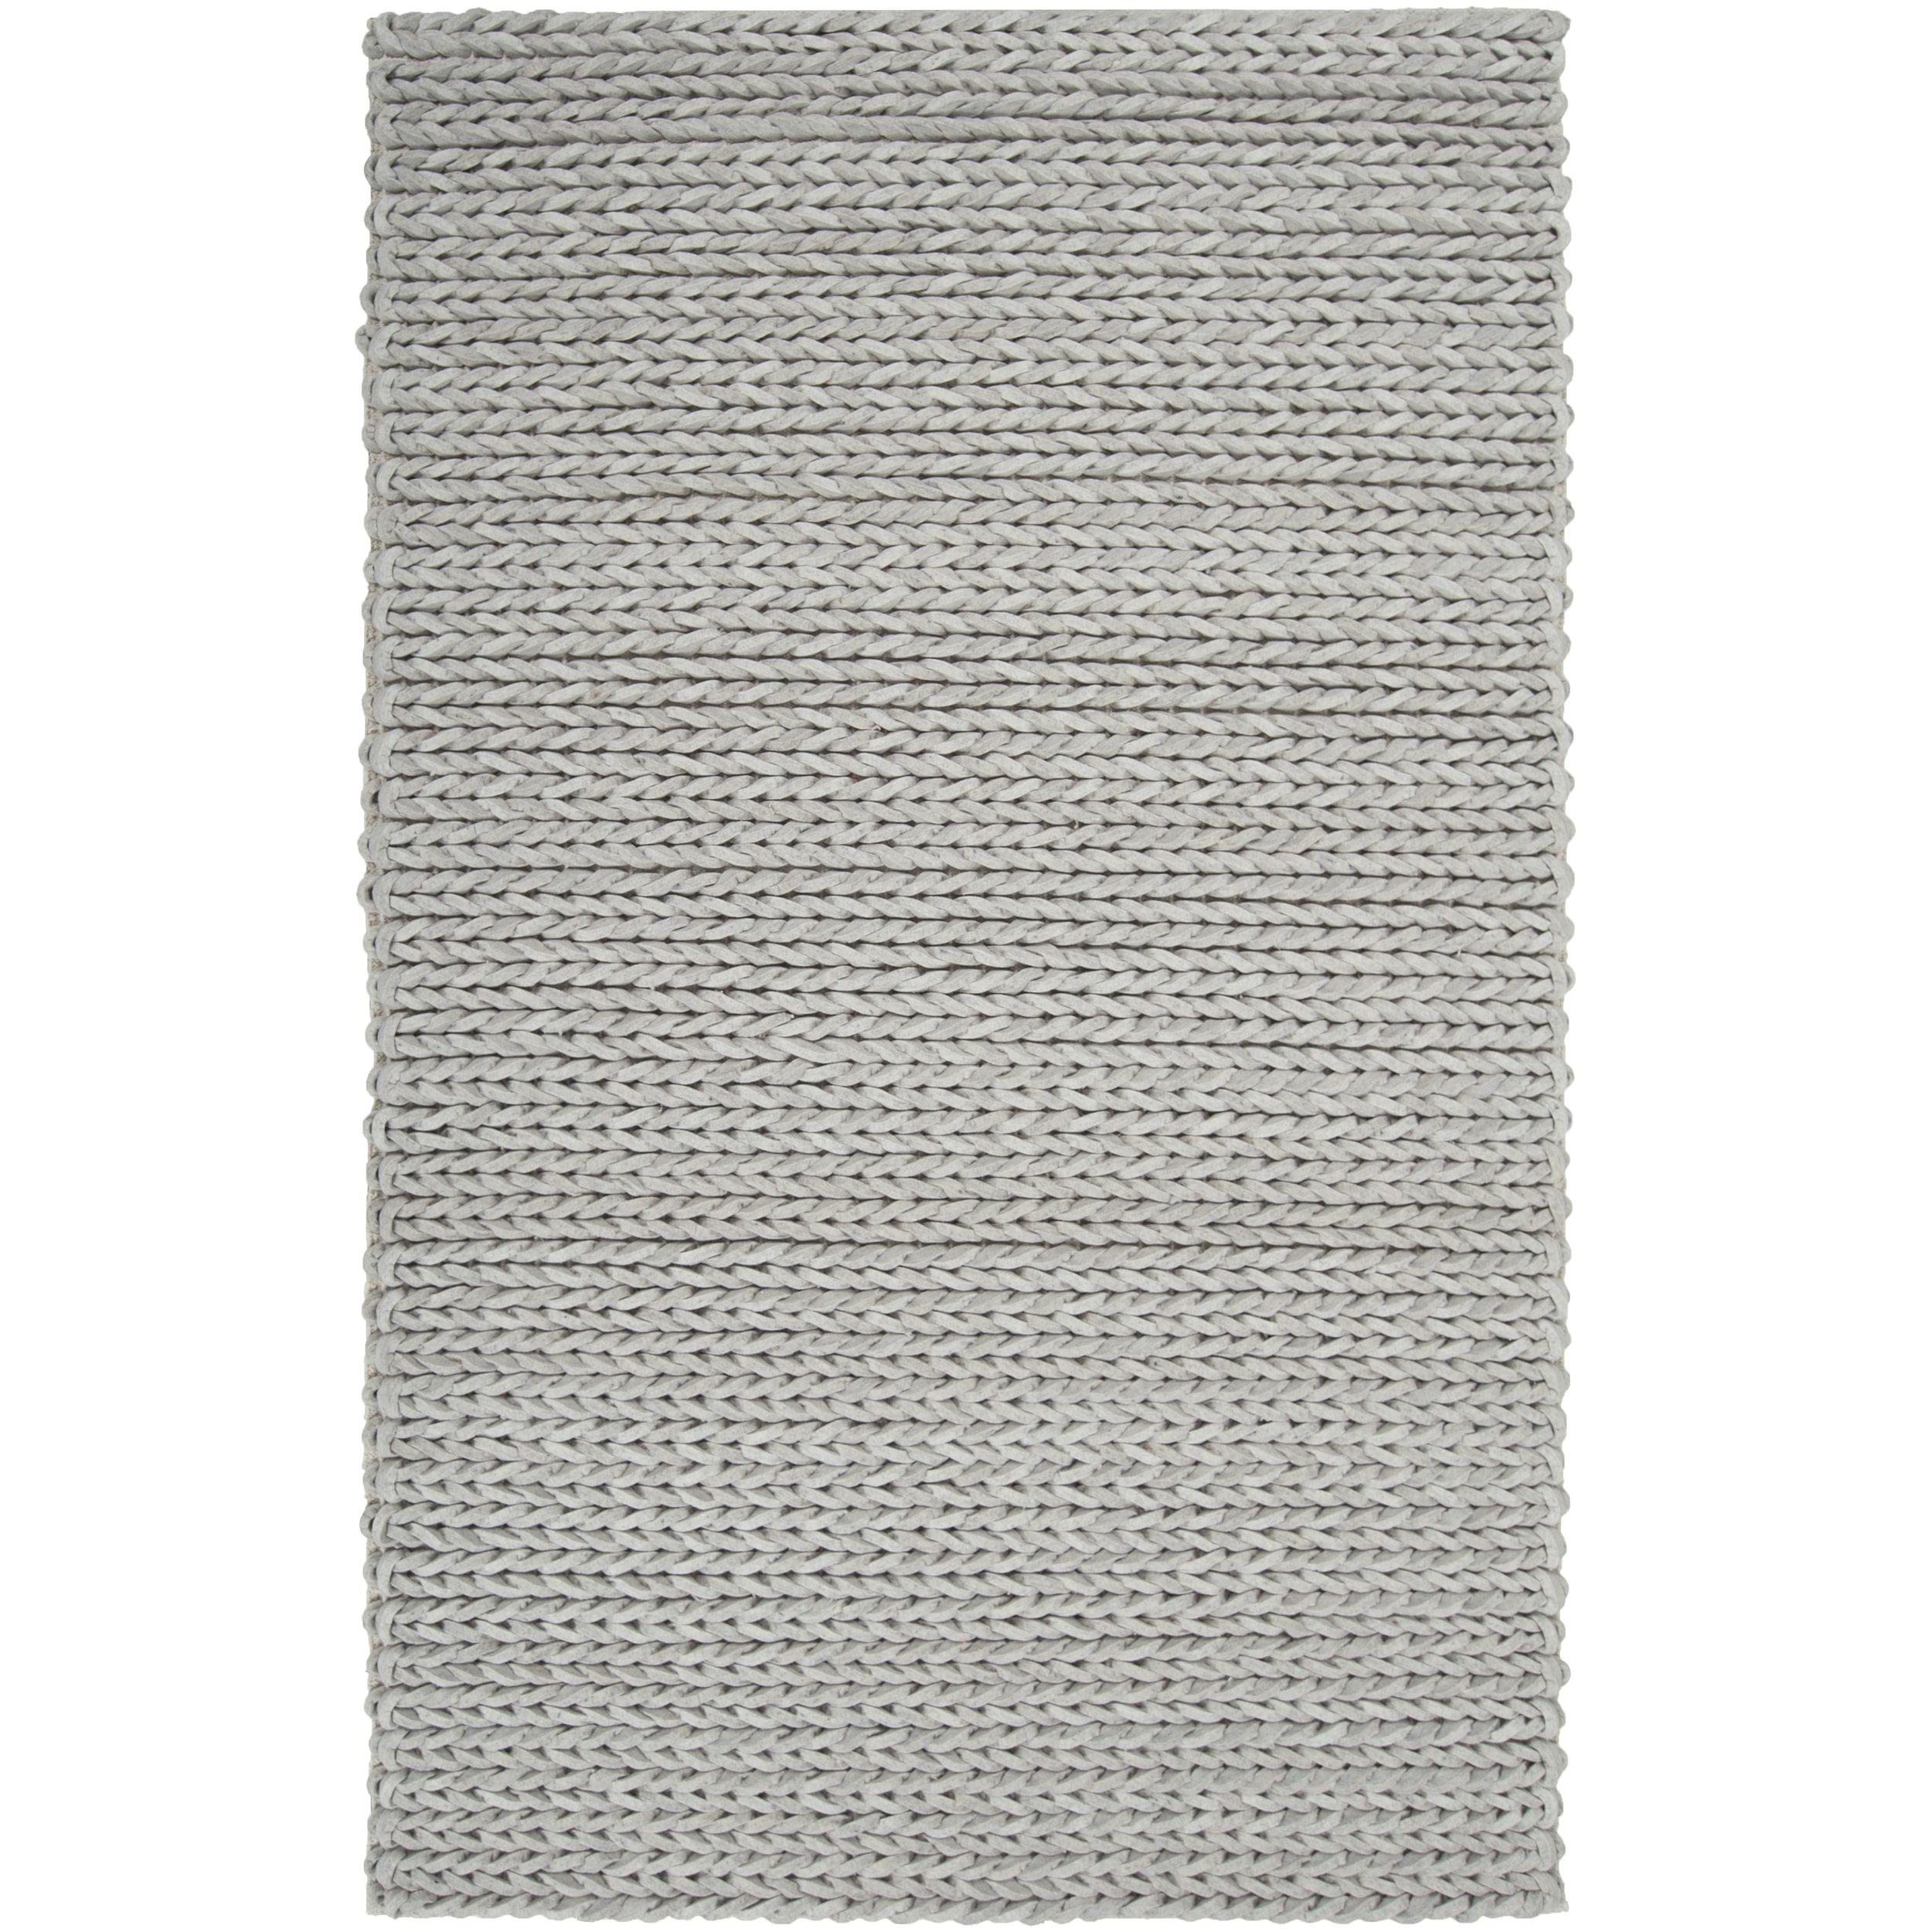 Hand-woven Terni Braided Texture New Zealand Wool Rug ( 5' x 8' )